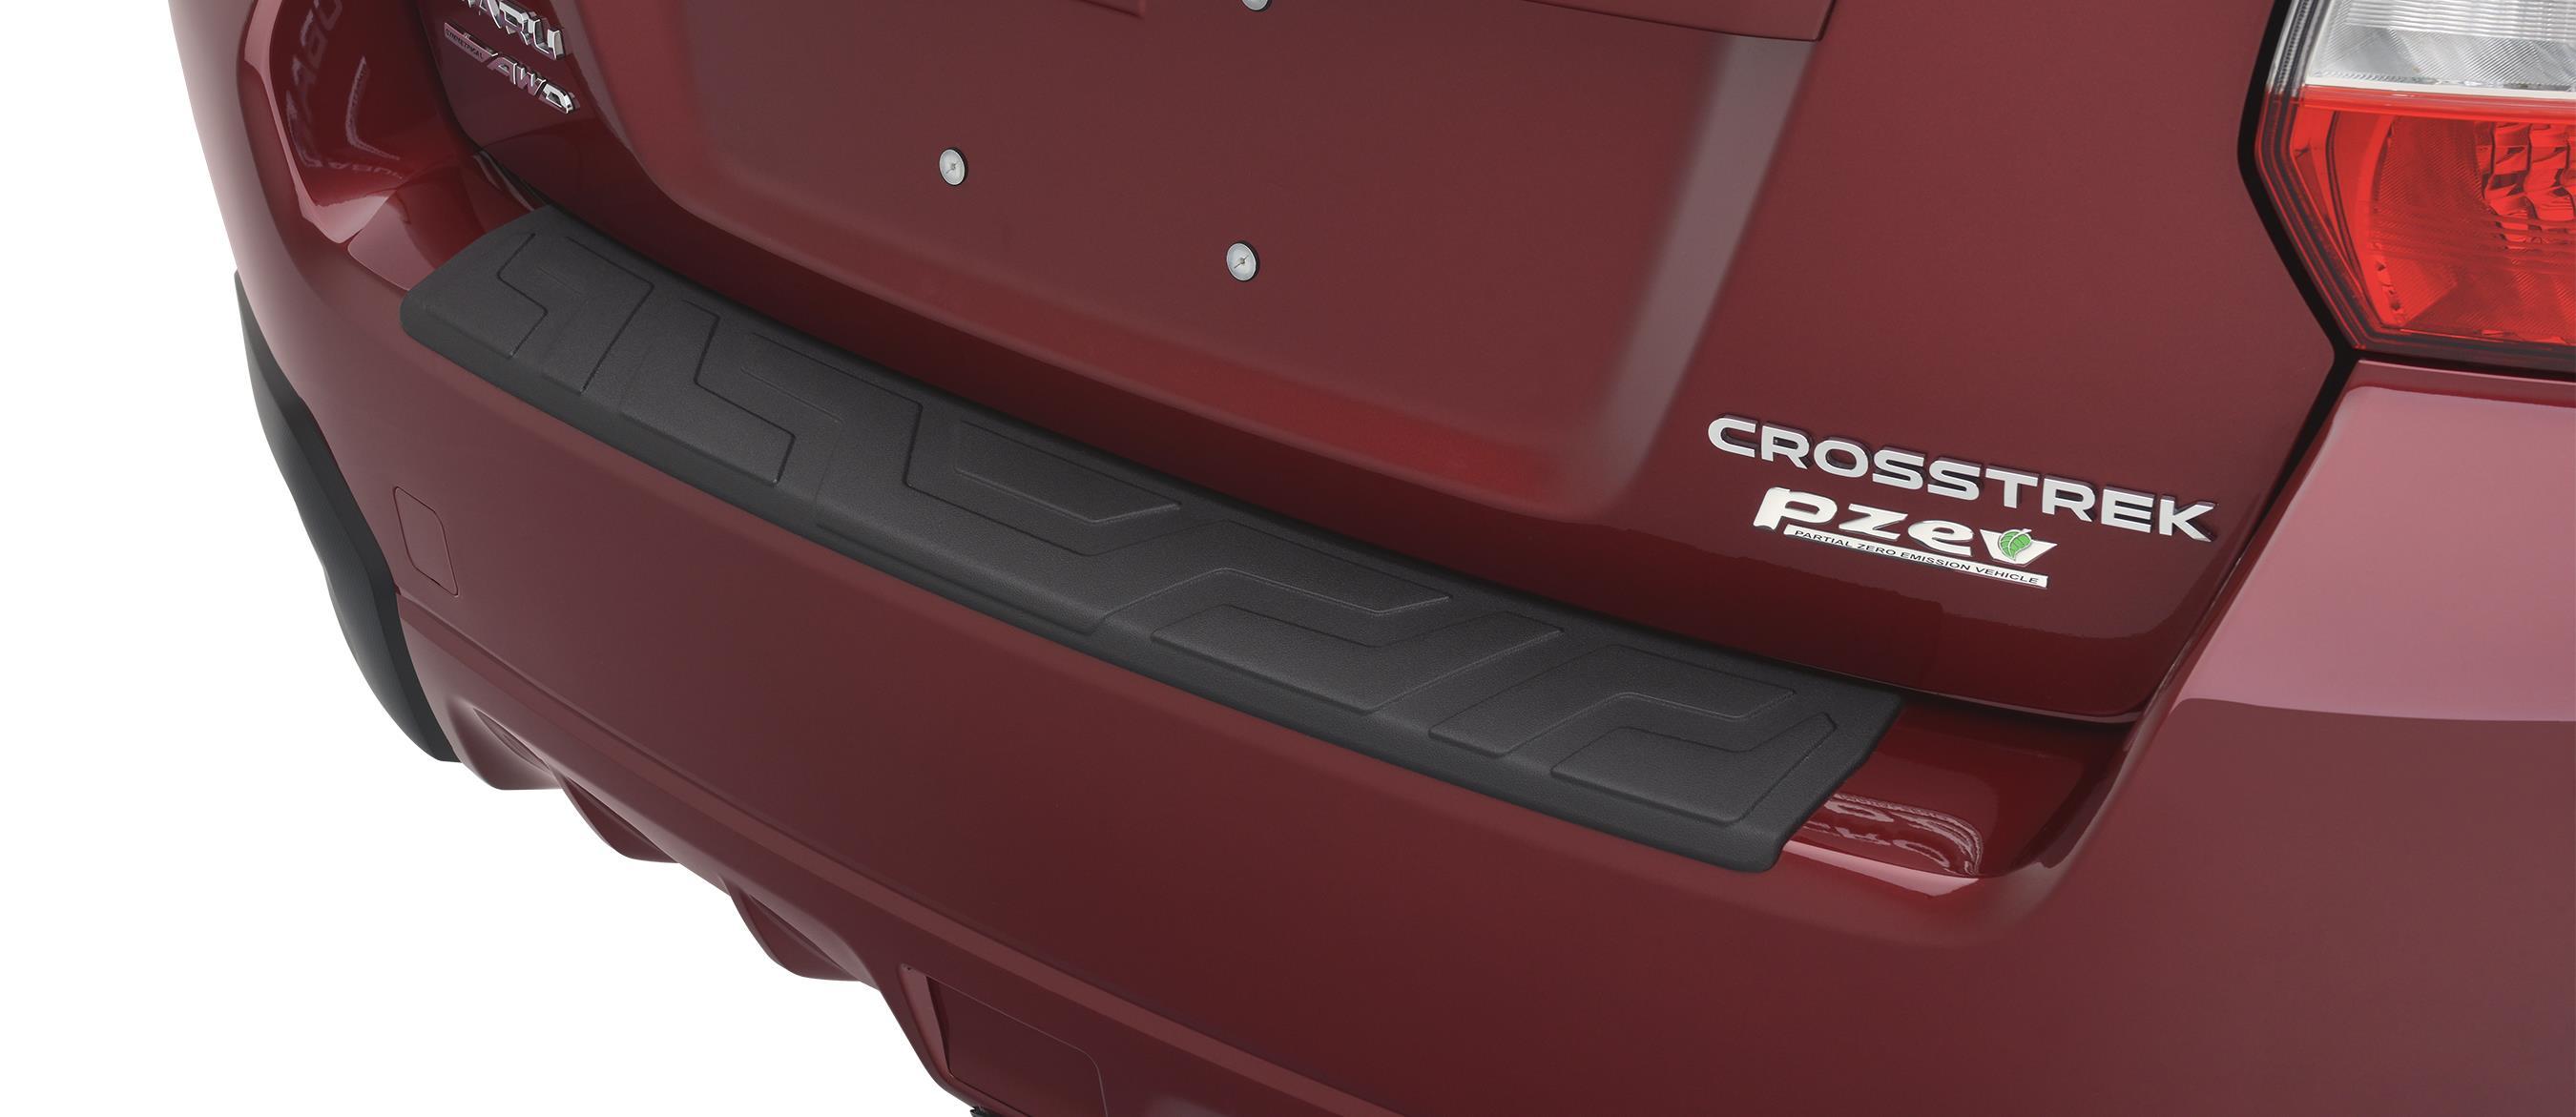 2016 Subaru Crosstrek Rear Bumper Cover Security